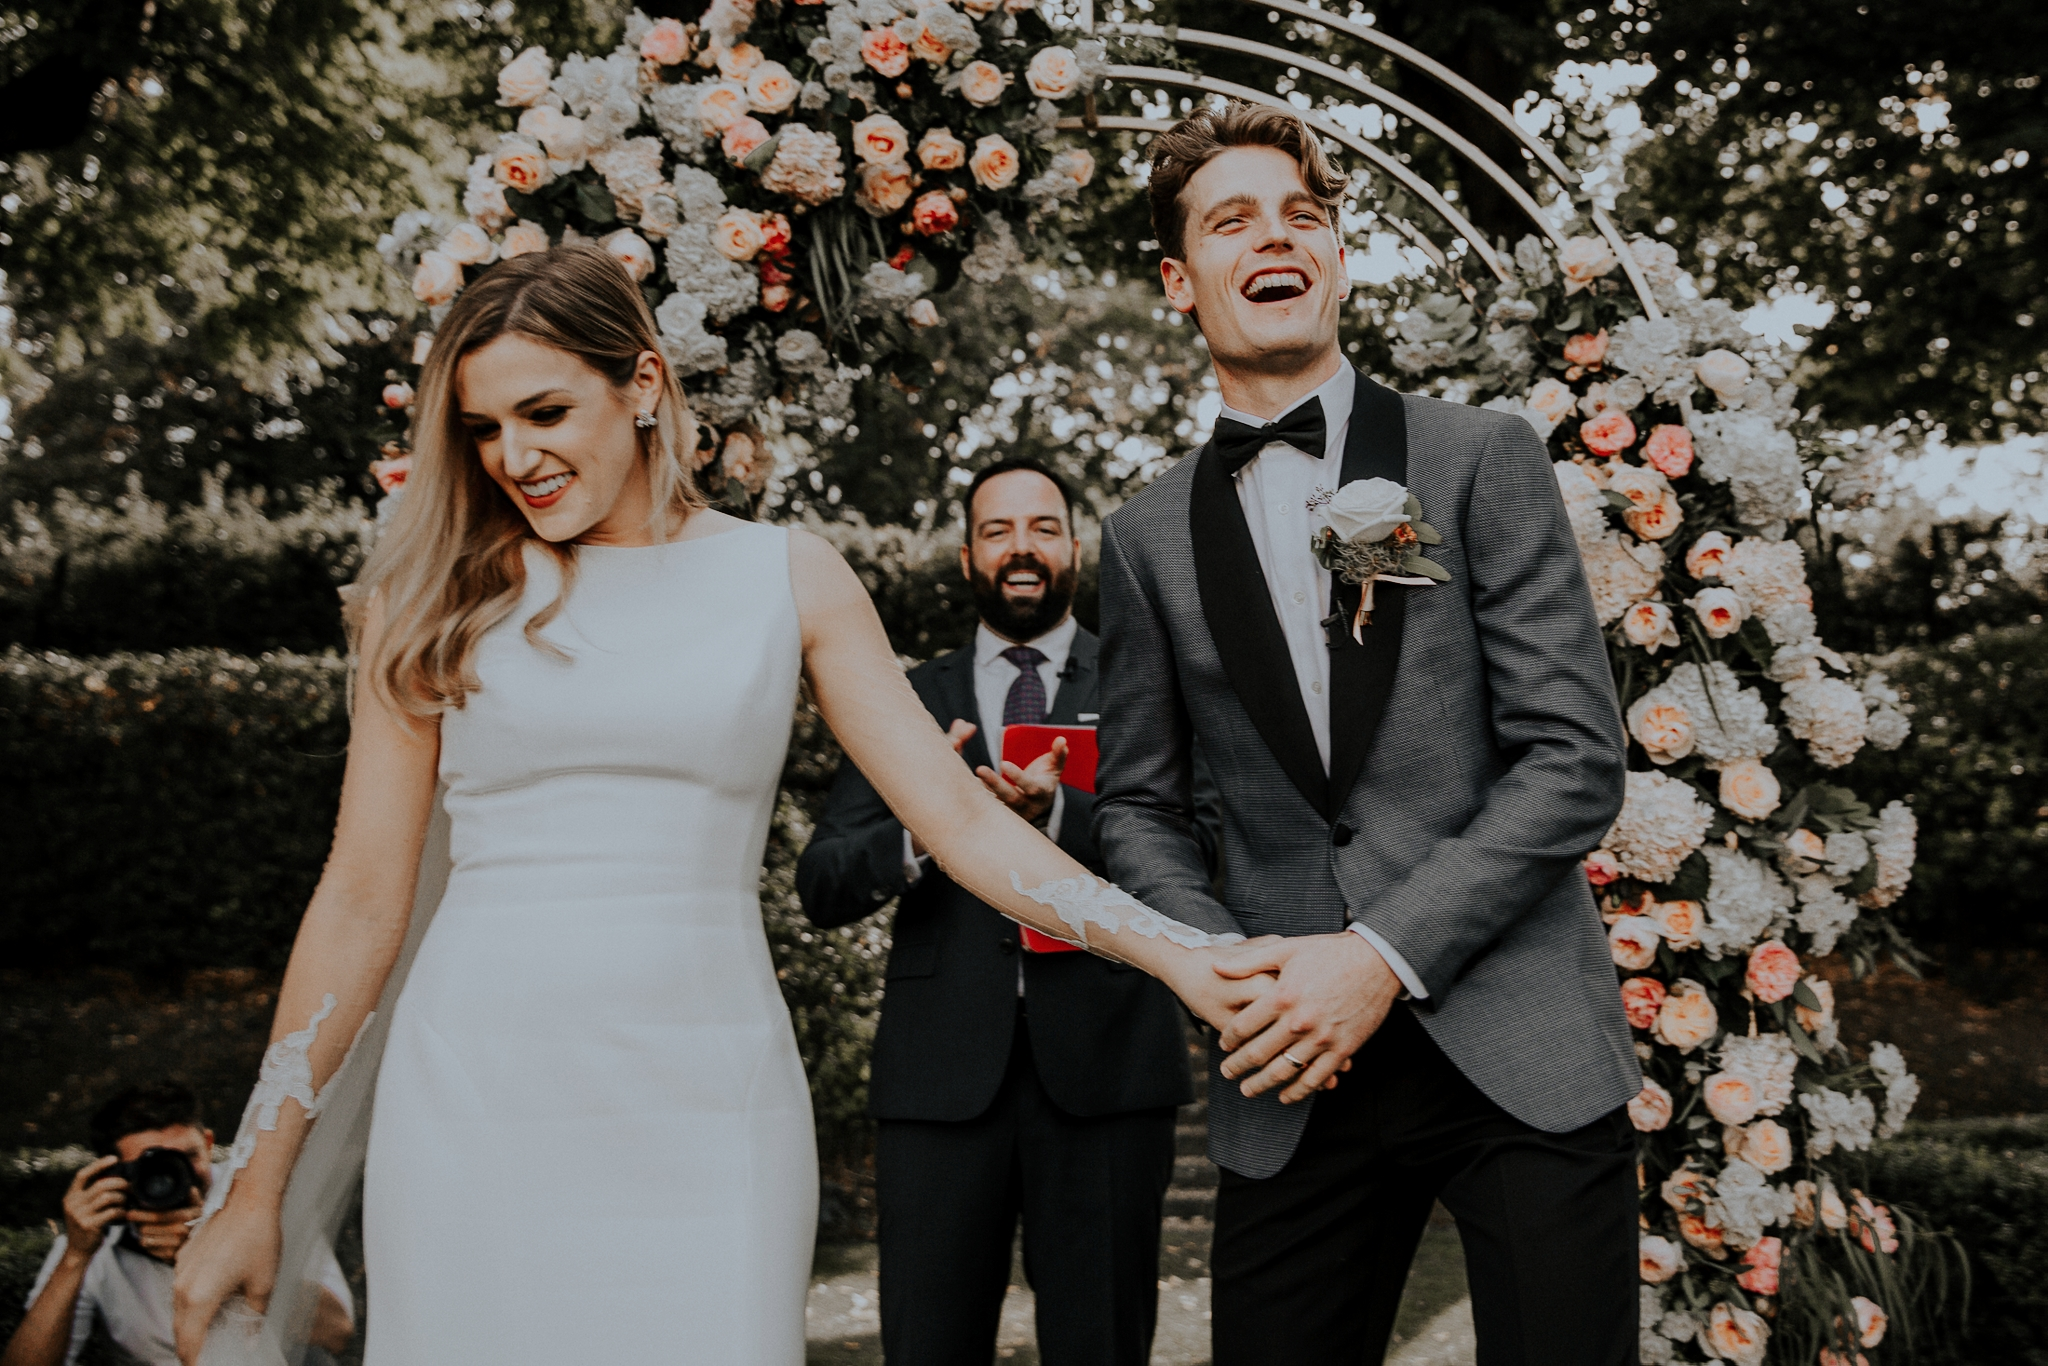 destination-austin-wedding-photographer-italy-florence481.JPG